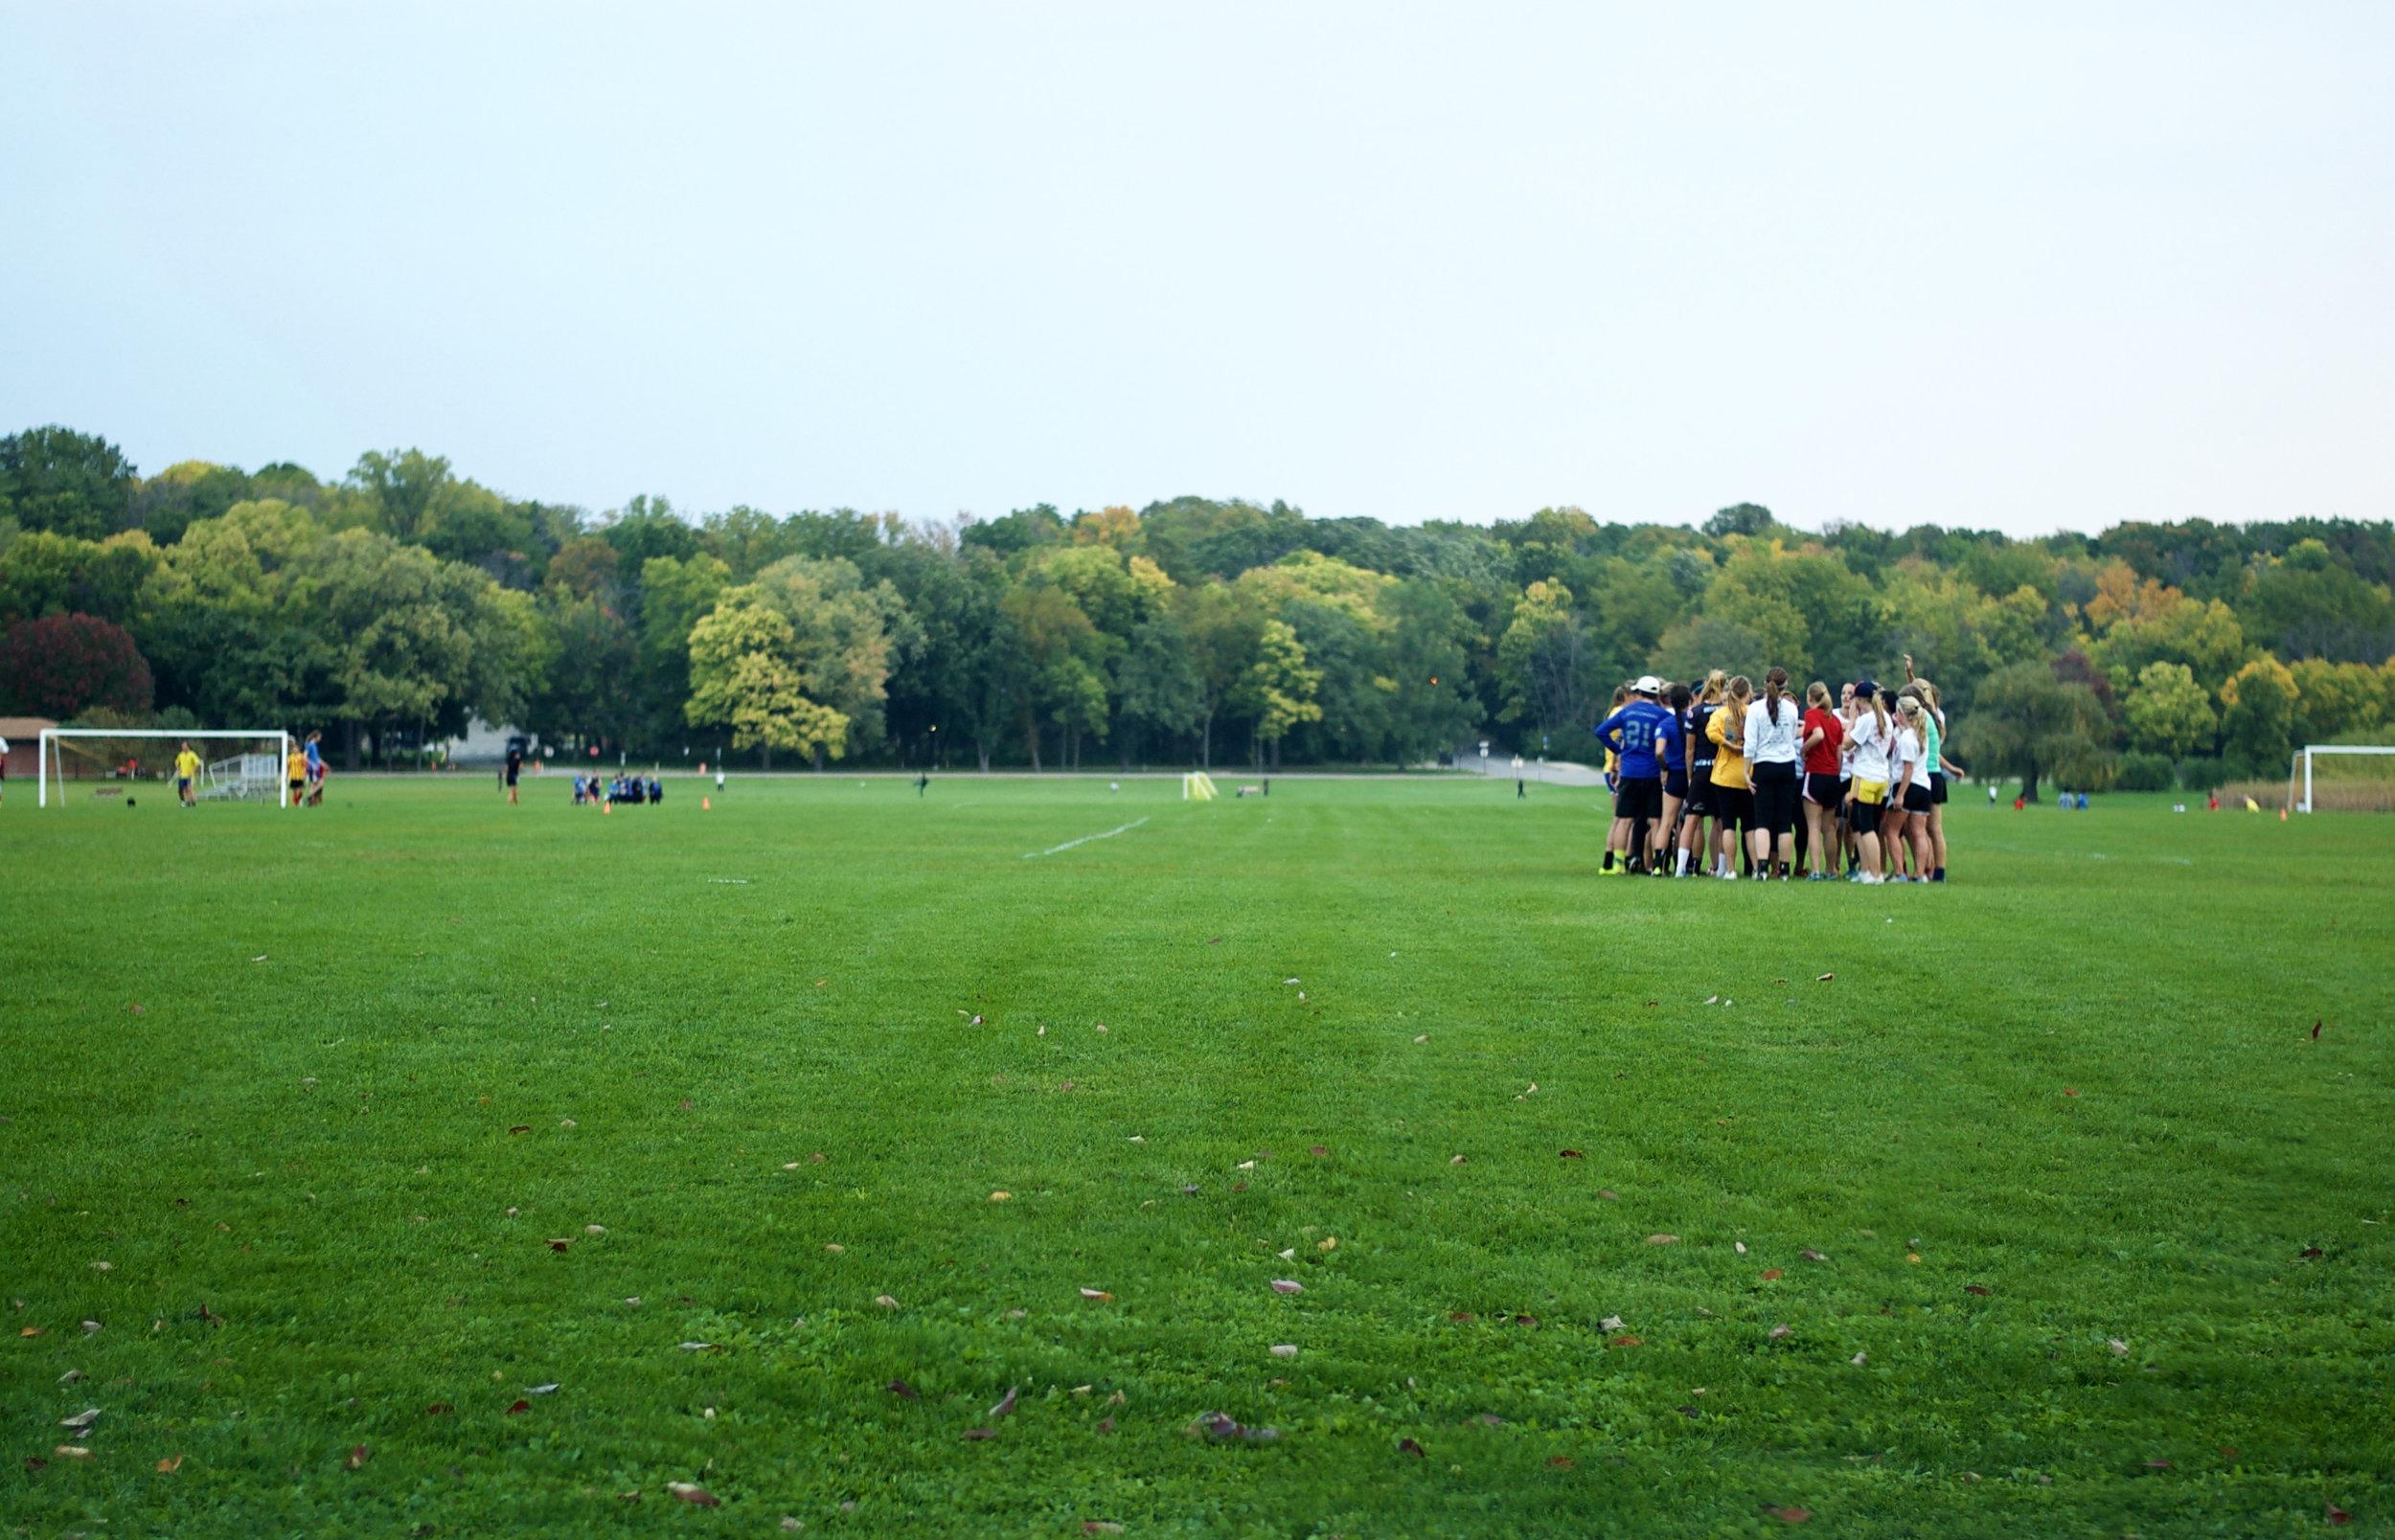 Huddle. University Bay Fields. Madison, Wisconsin. October 2014. © William D. Walker